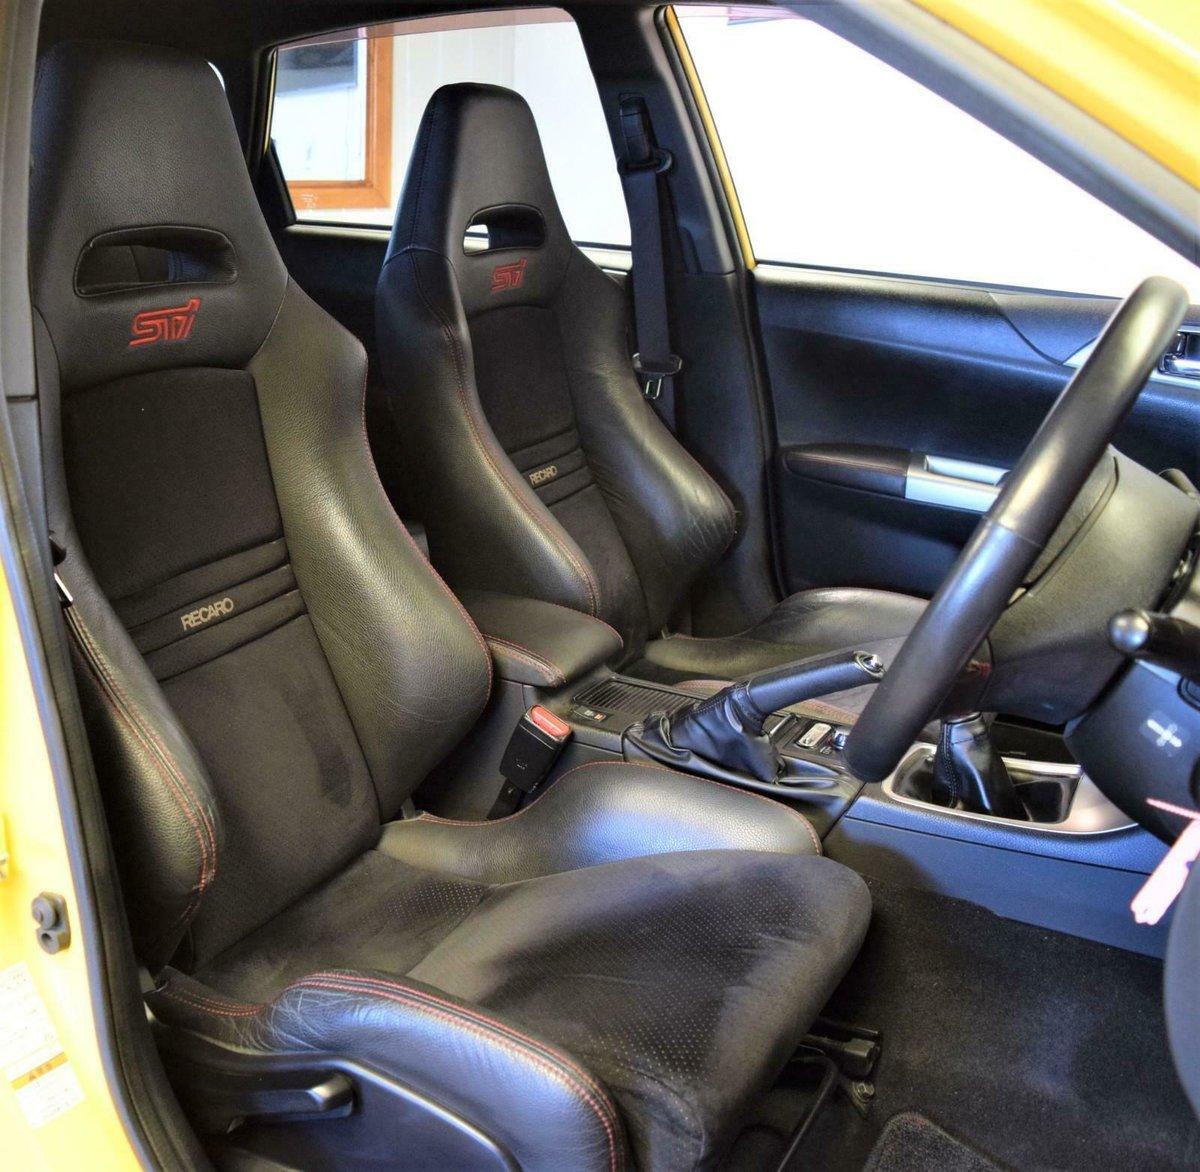 2009 Subaru Impreza 2.0 WRX STi Spec-C JDM Import Model For Sale (picture 9 of 12)